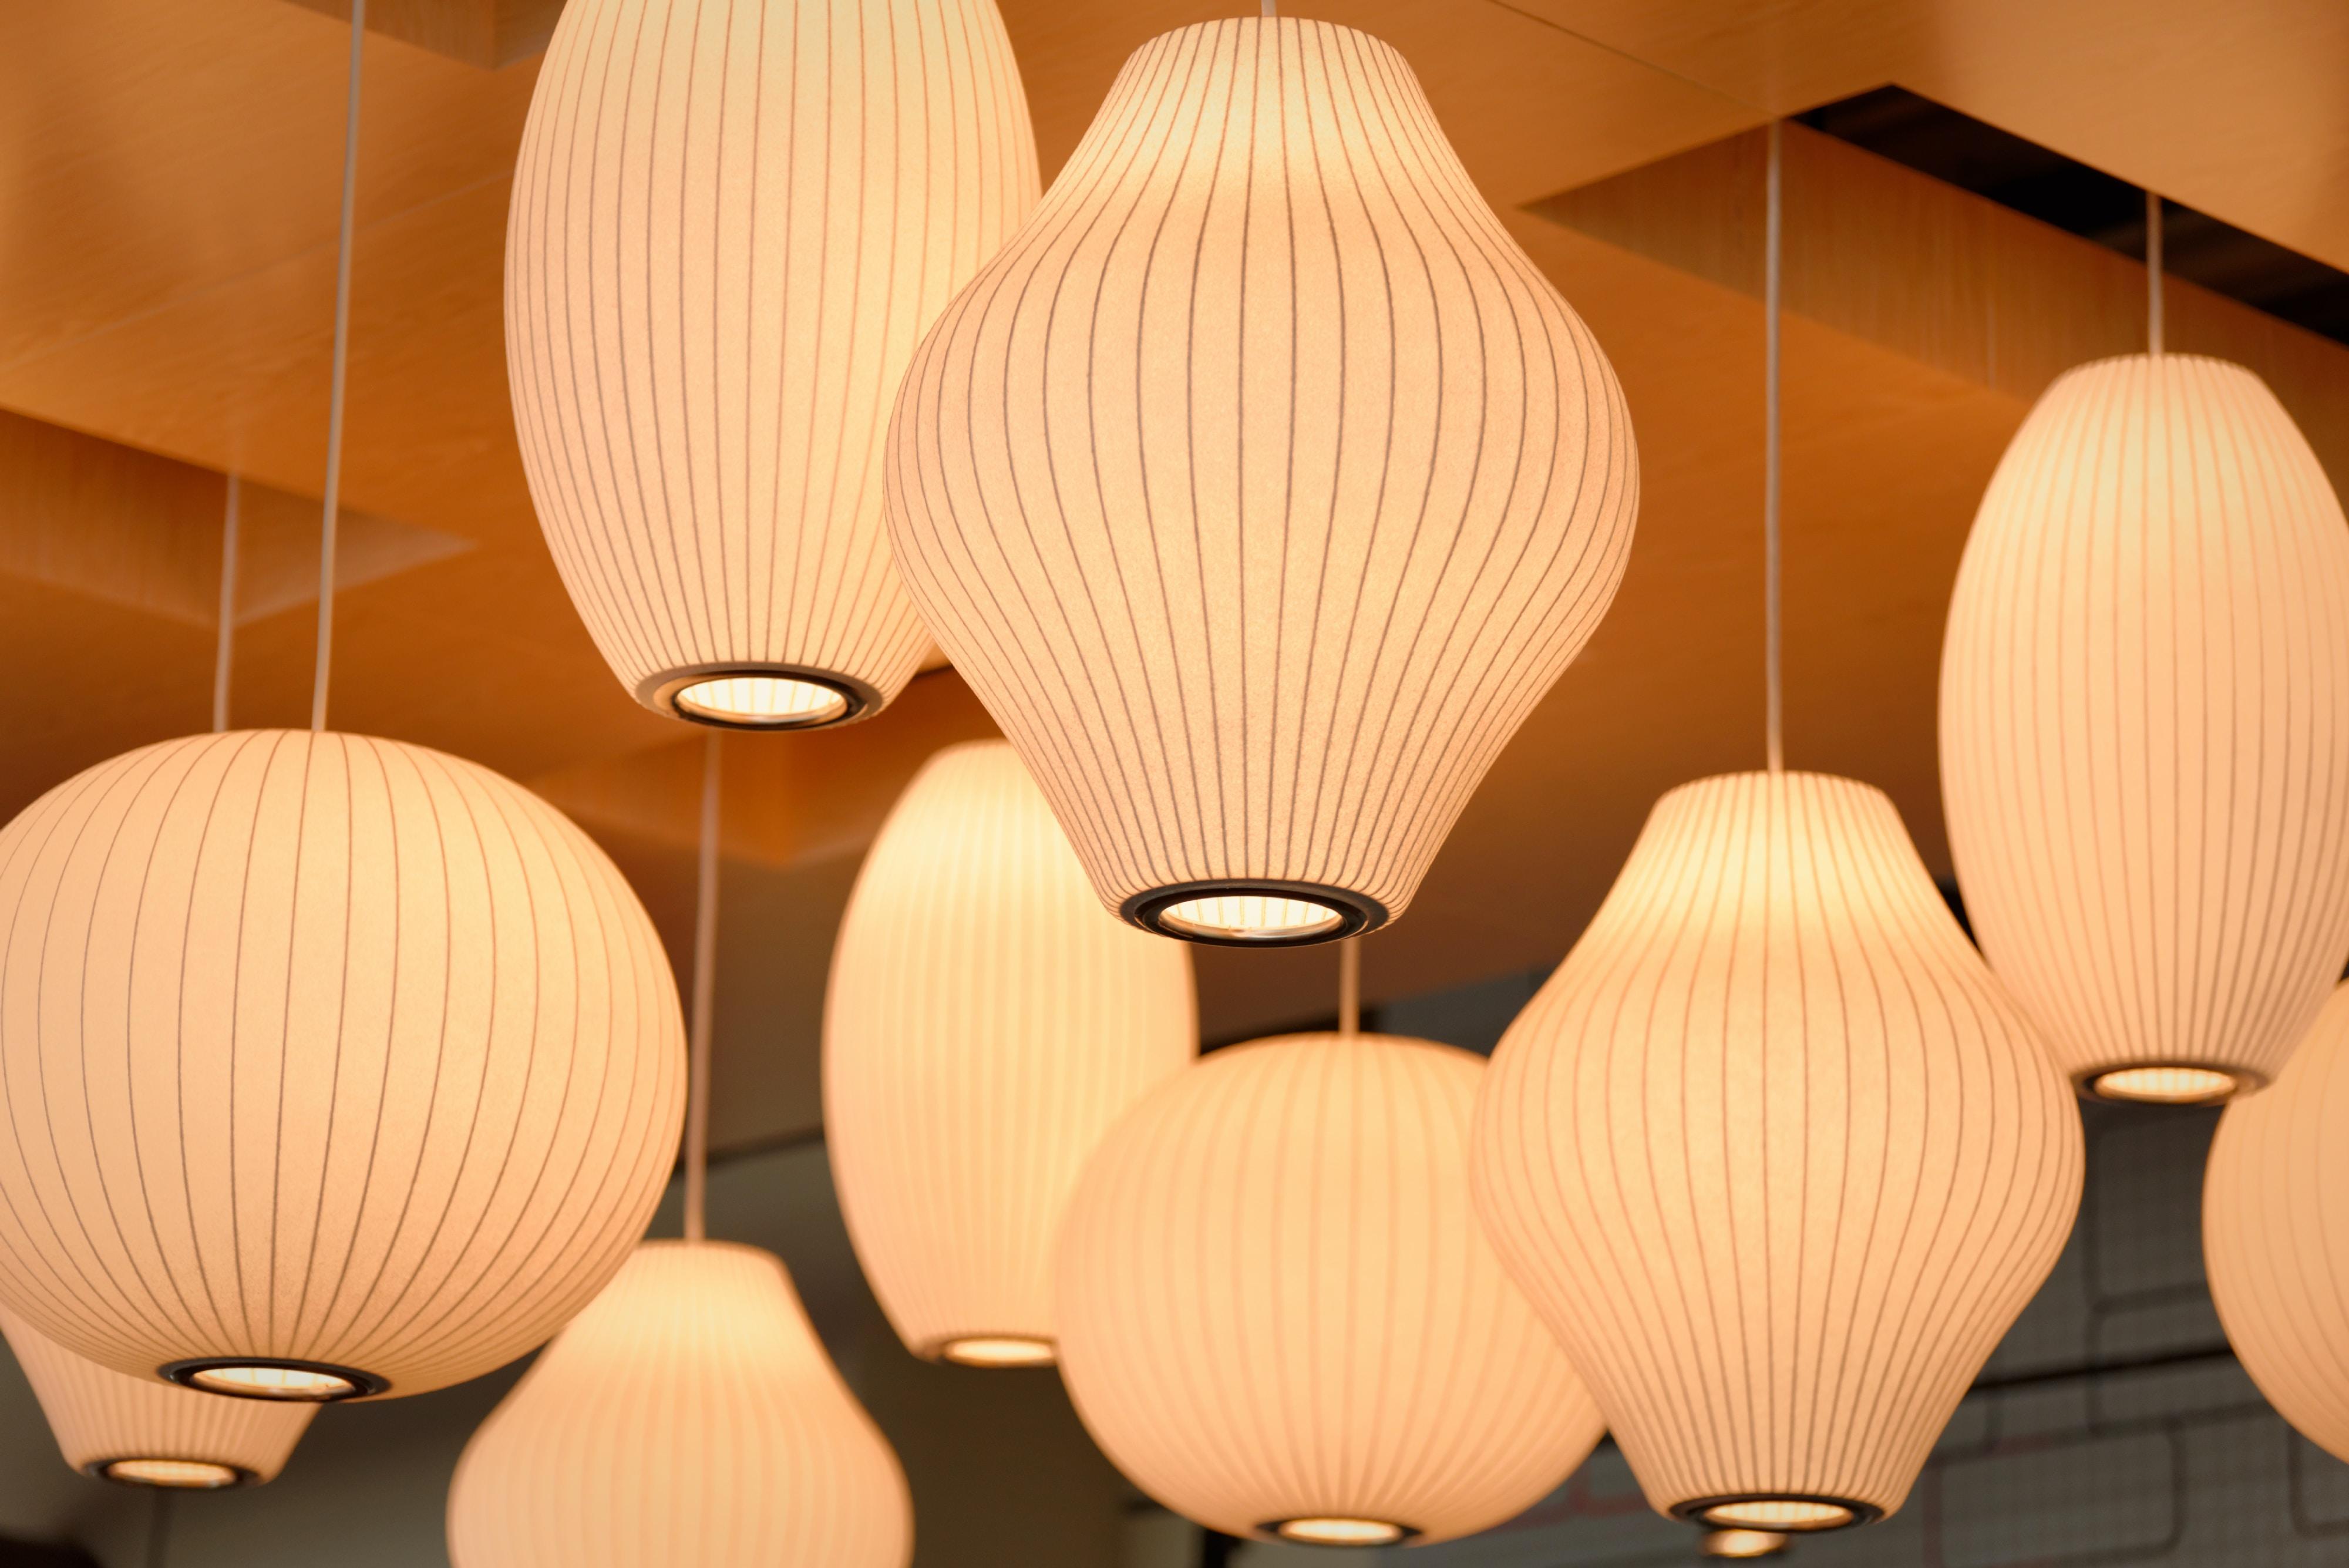 Multiple lanterns hanging from an orange ceiling